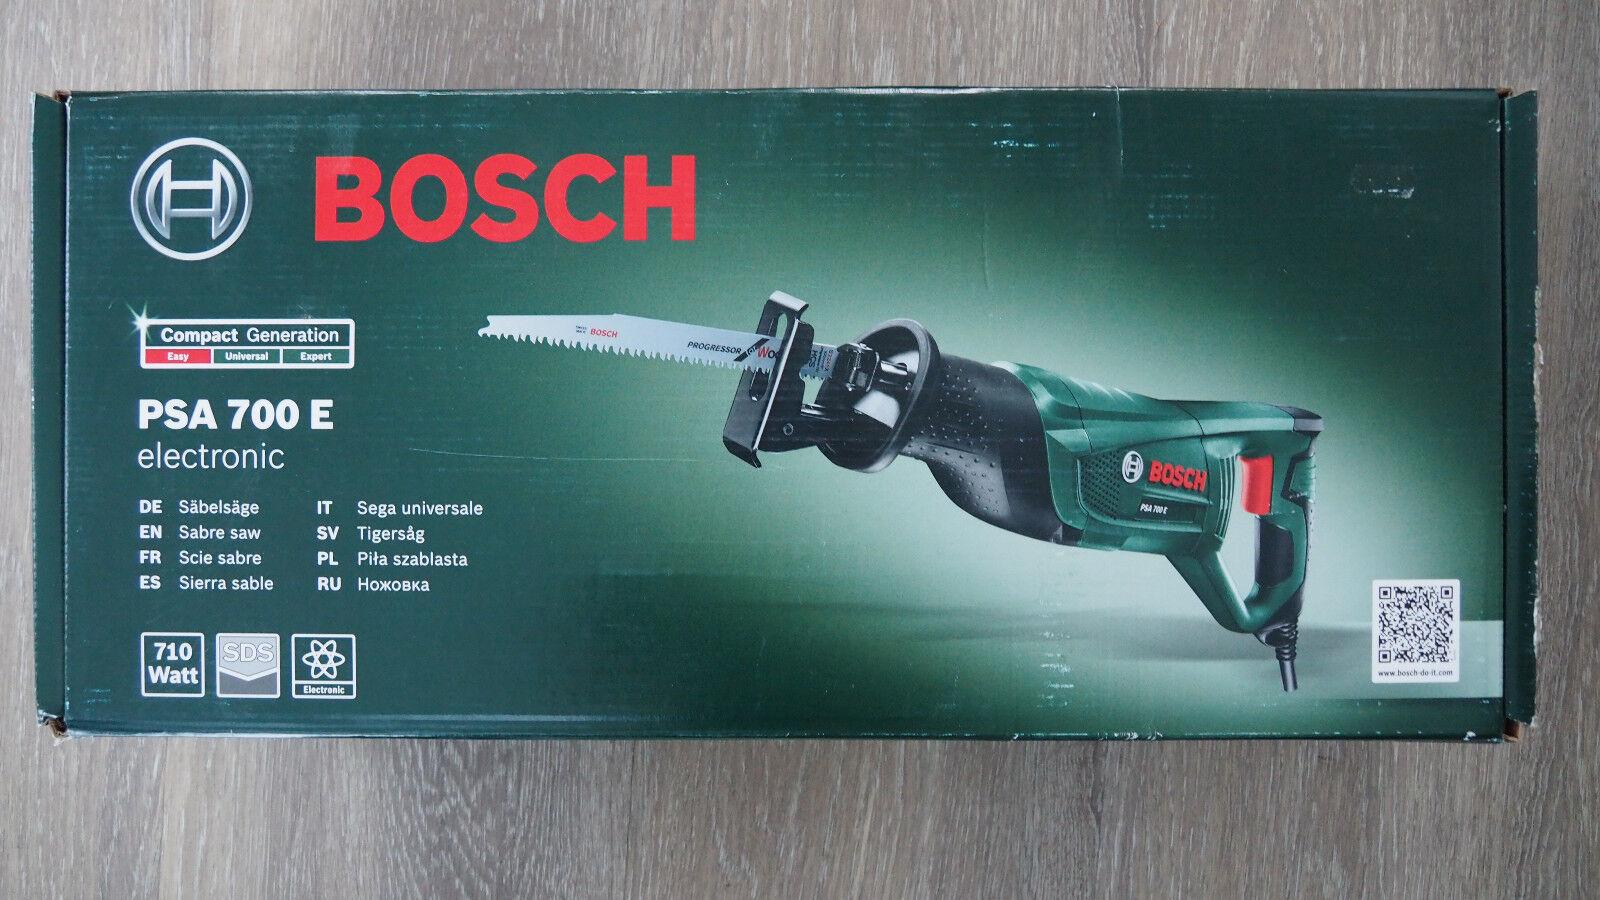 Bosch Säbelsäge PSA700 E - 710 Watt